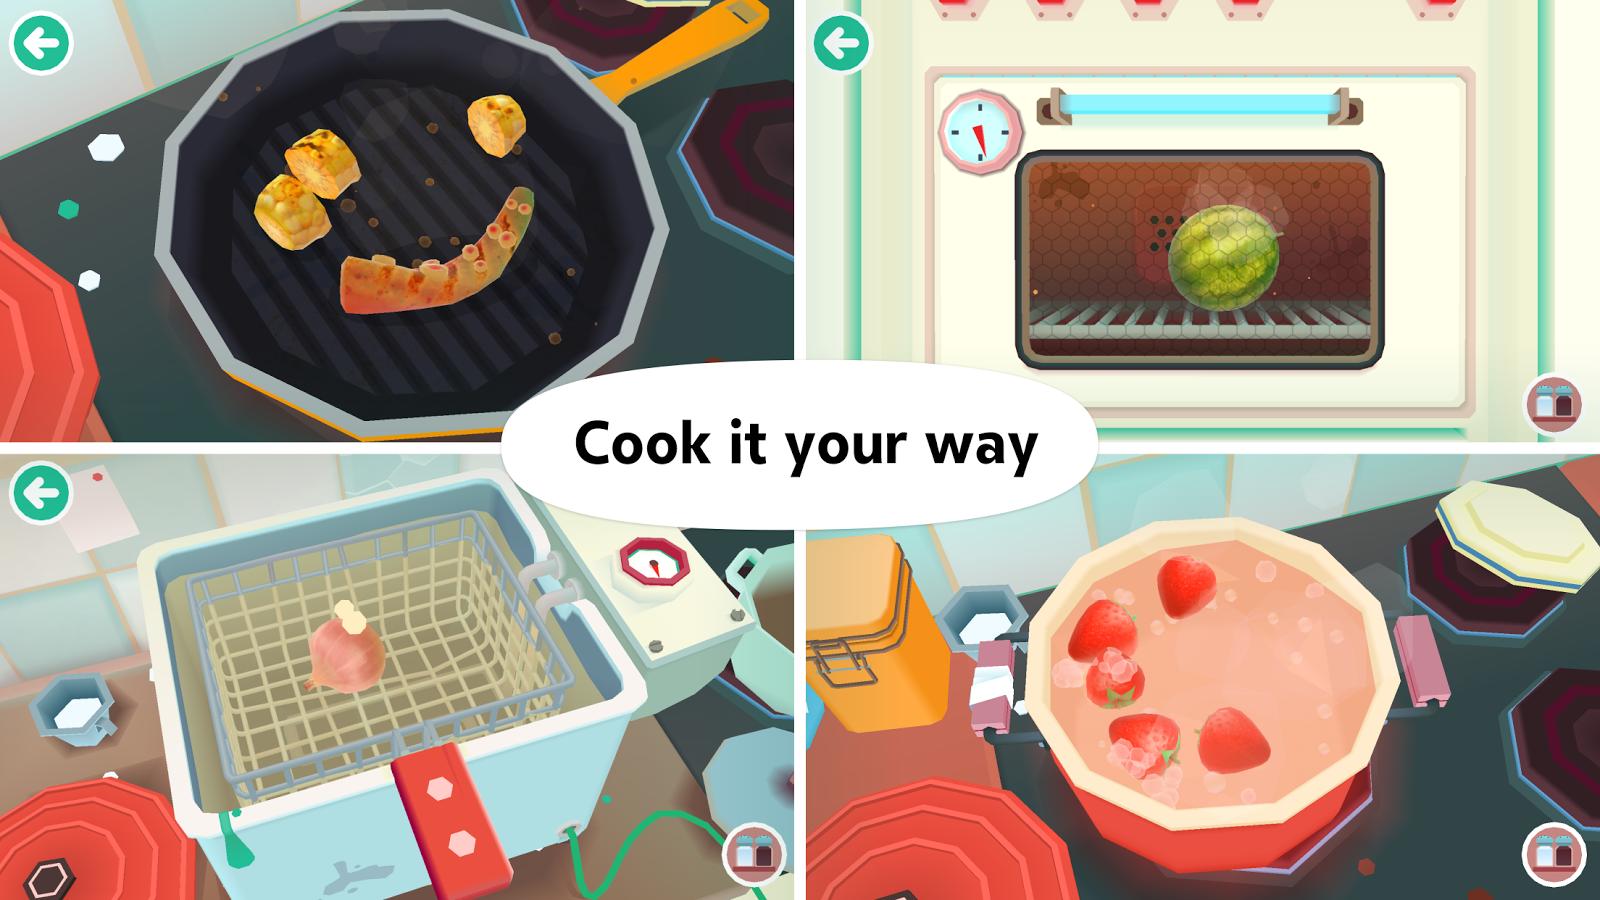 toca kitchen 2 скачать на андроид